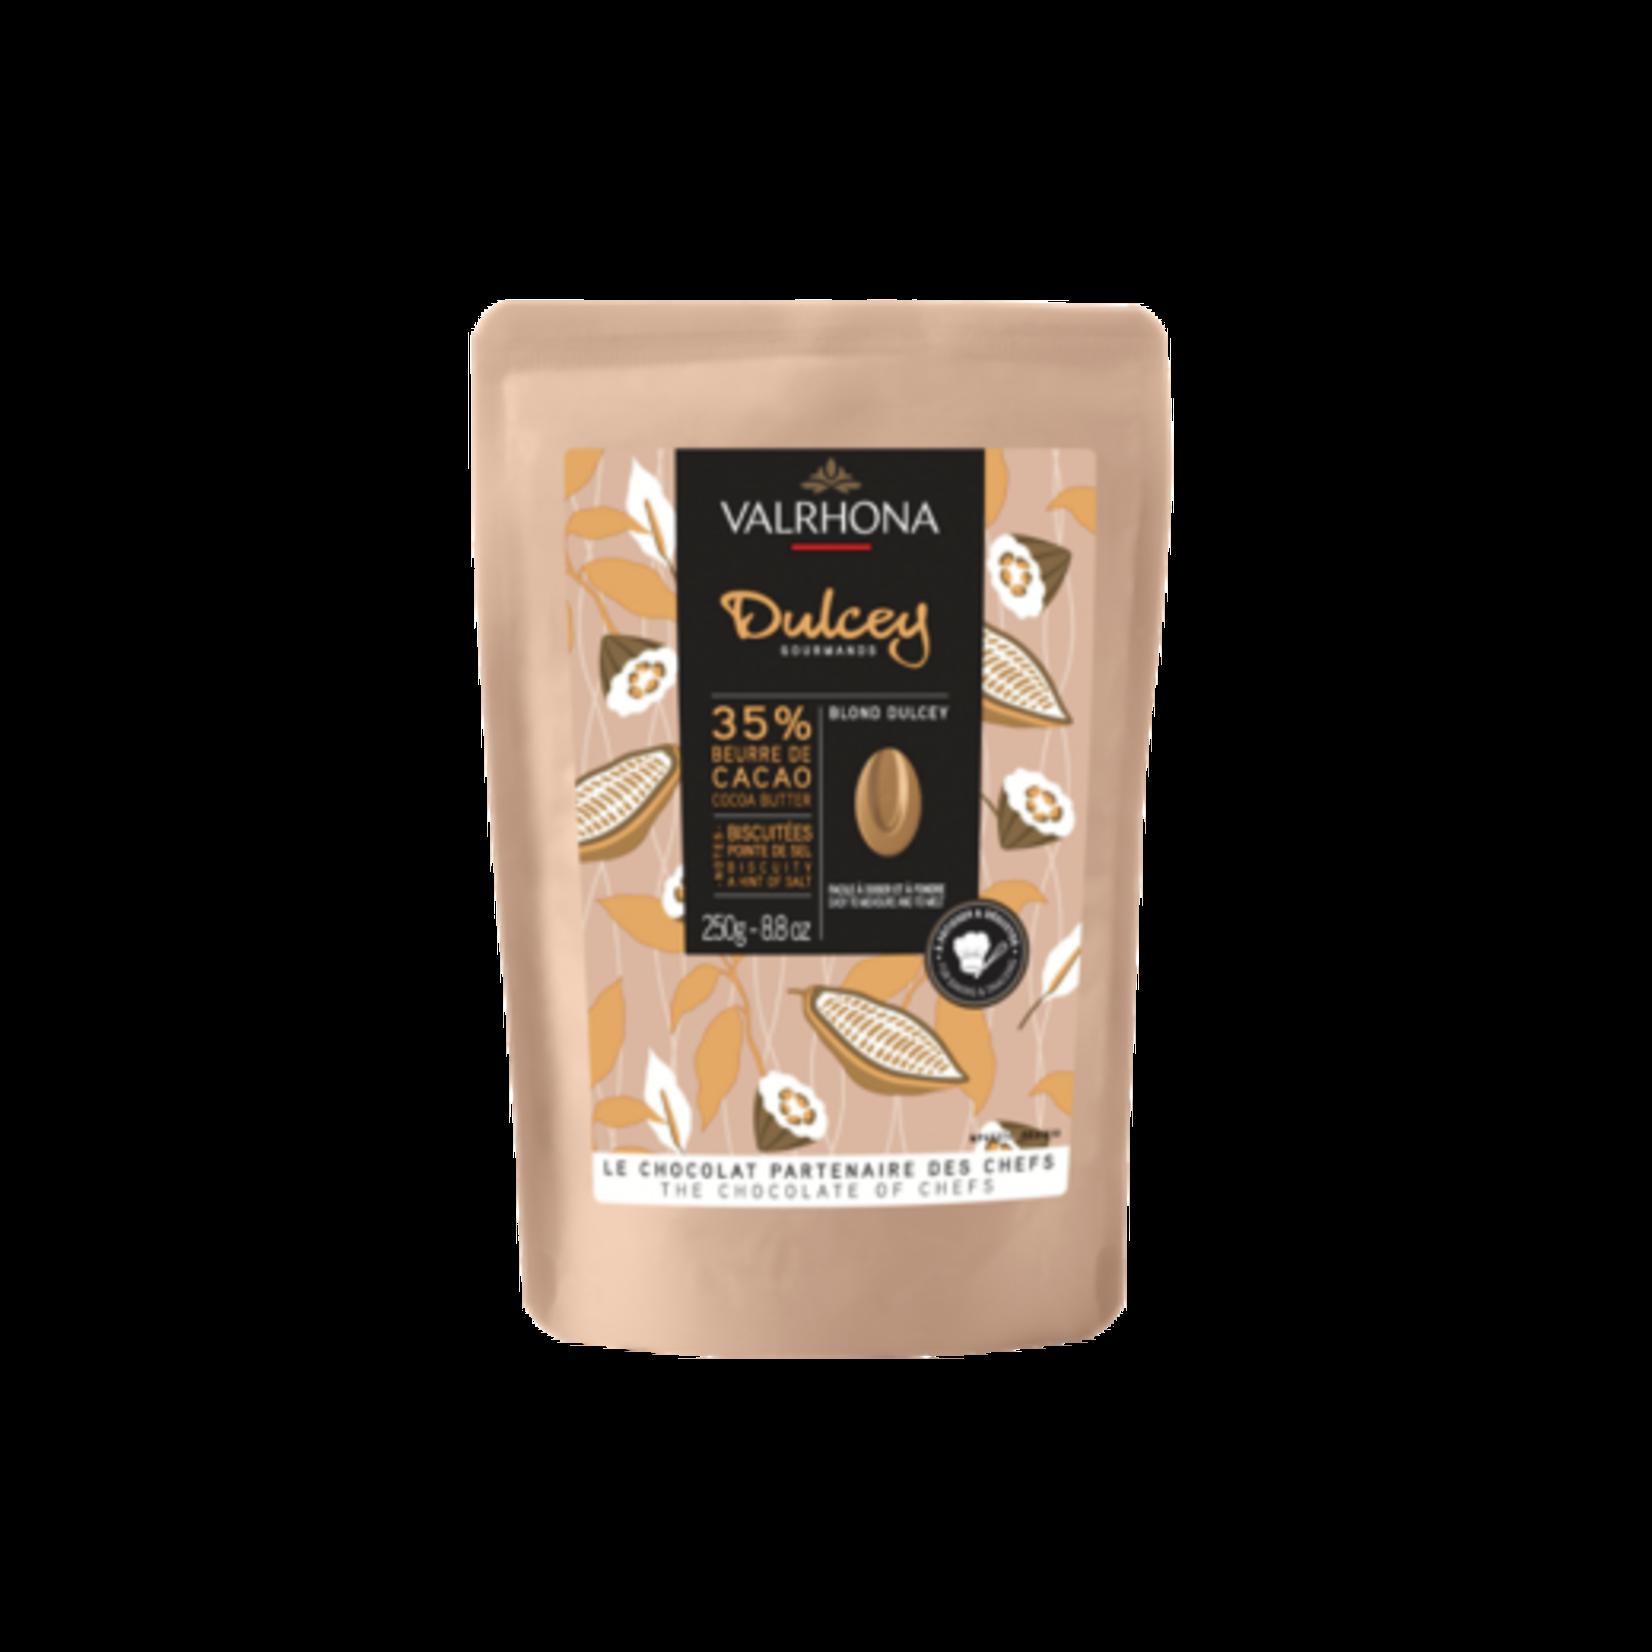 Valrhona Valrhona - Dulcey Blond Chocolate 35% - 250g/8.8oz, 31210